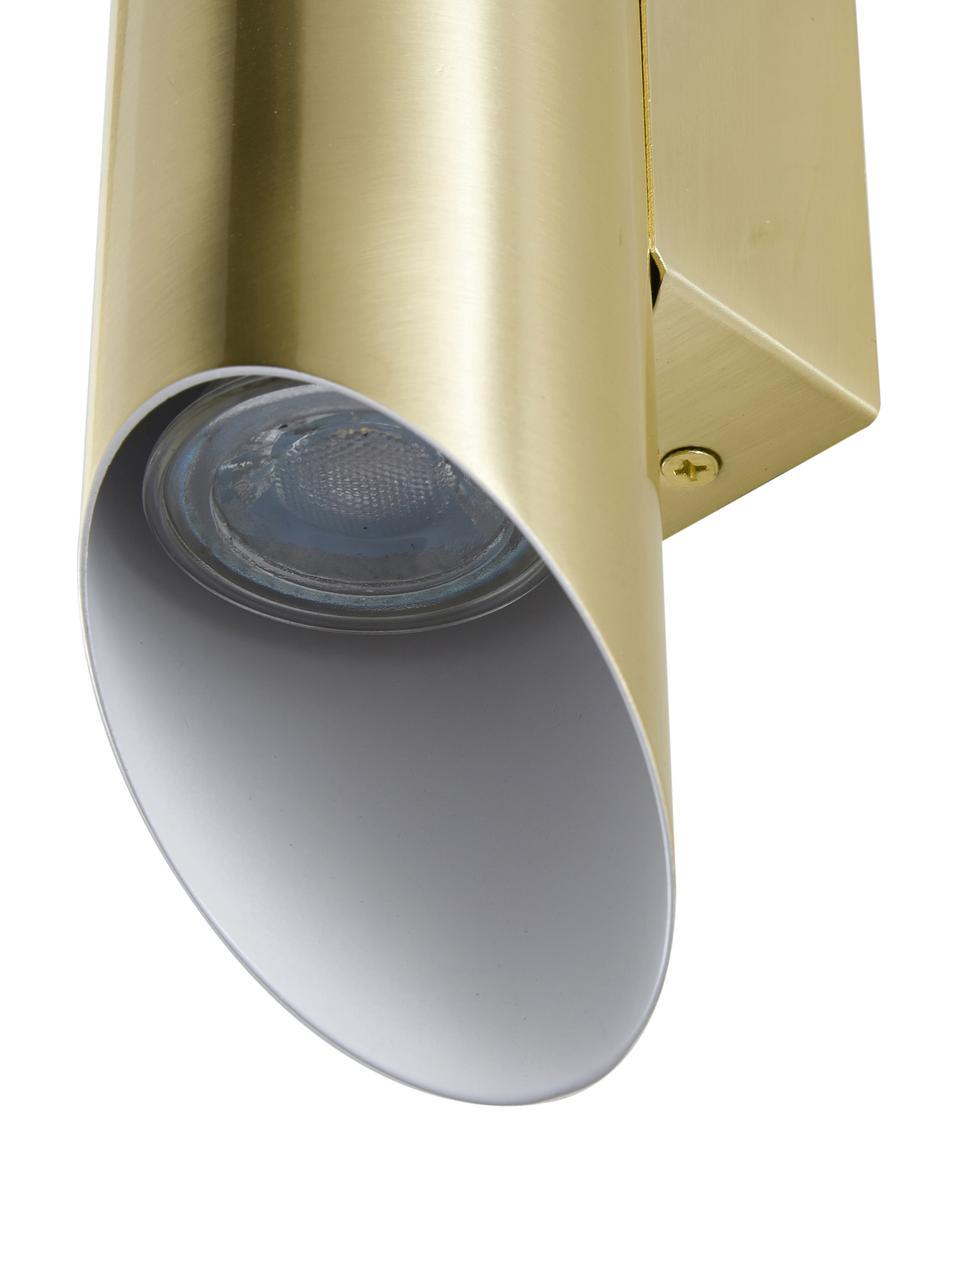 Applique dorata Renee, Paralume: metallo spazzolato, Dorato opaco, Larg. 7 x Alt. 28 cm